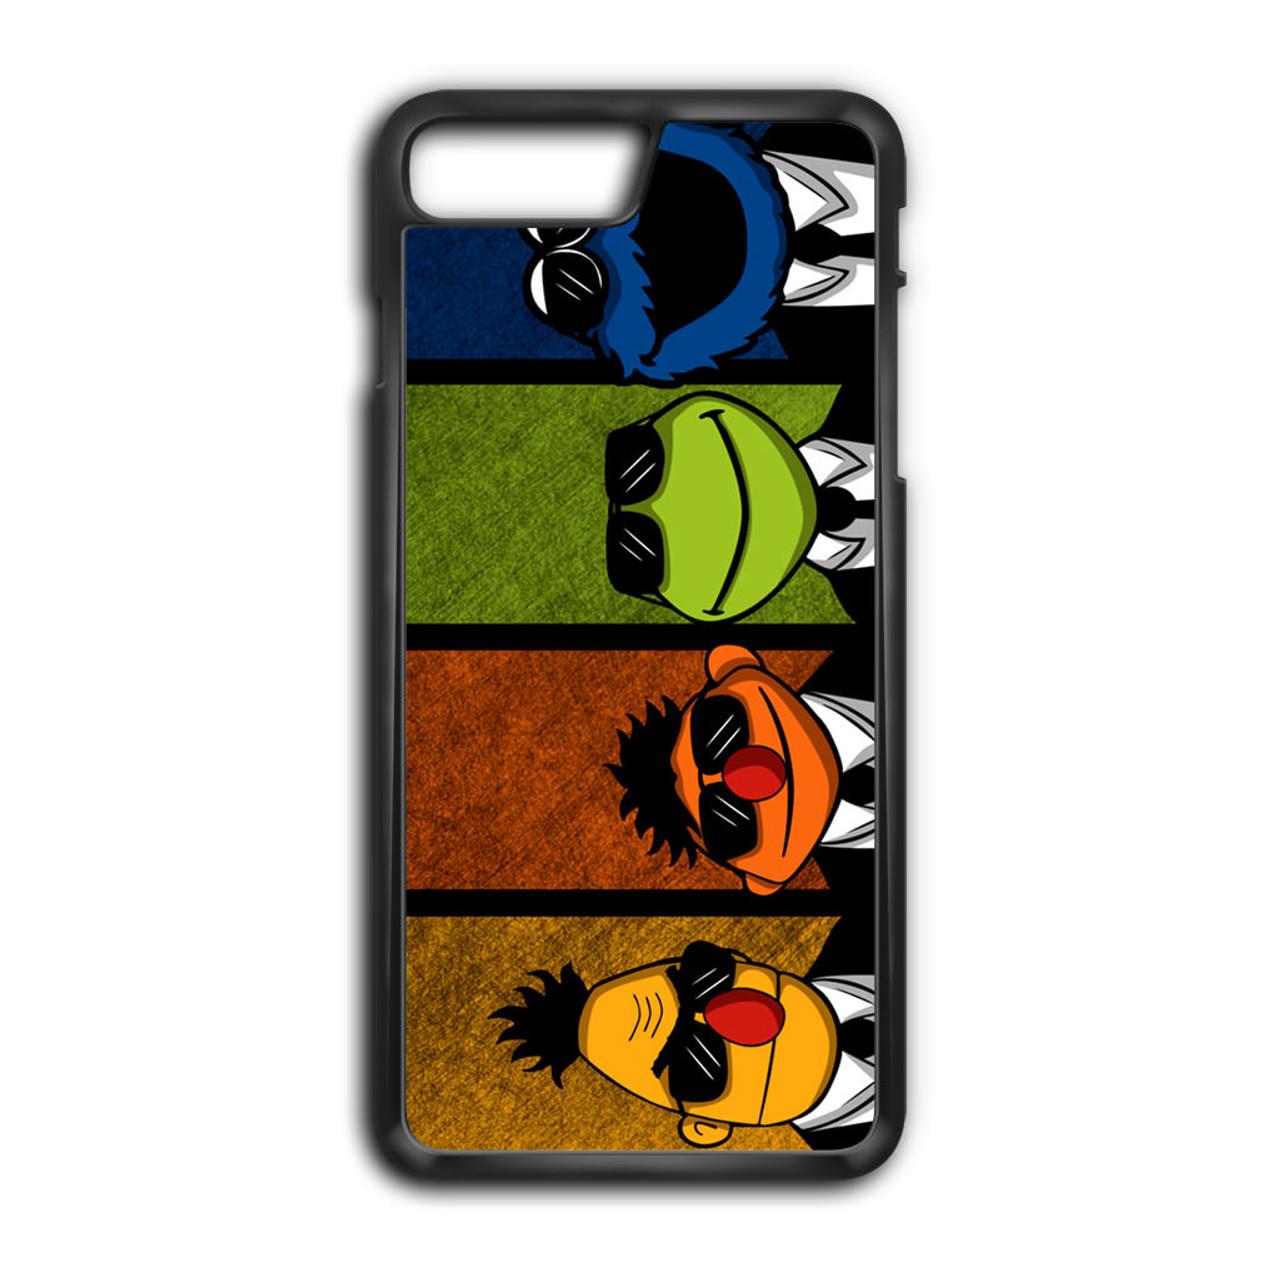 817a05e0f7b Reservoir Muppets iPhone 8 Plus Case - CASESHUNTER